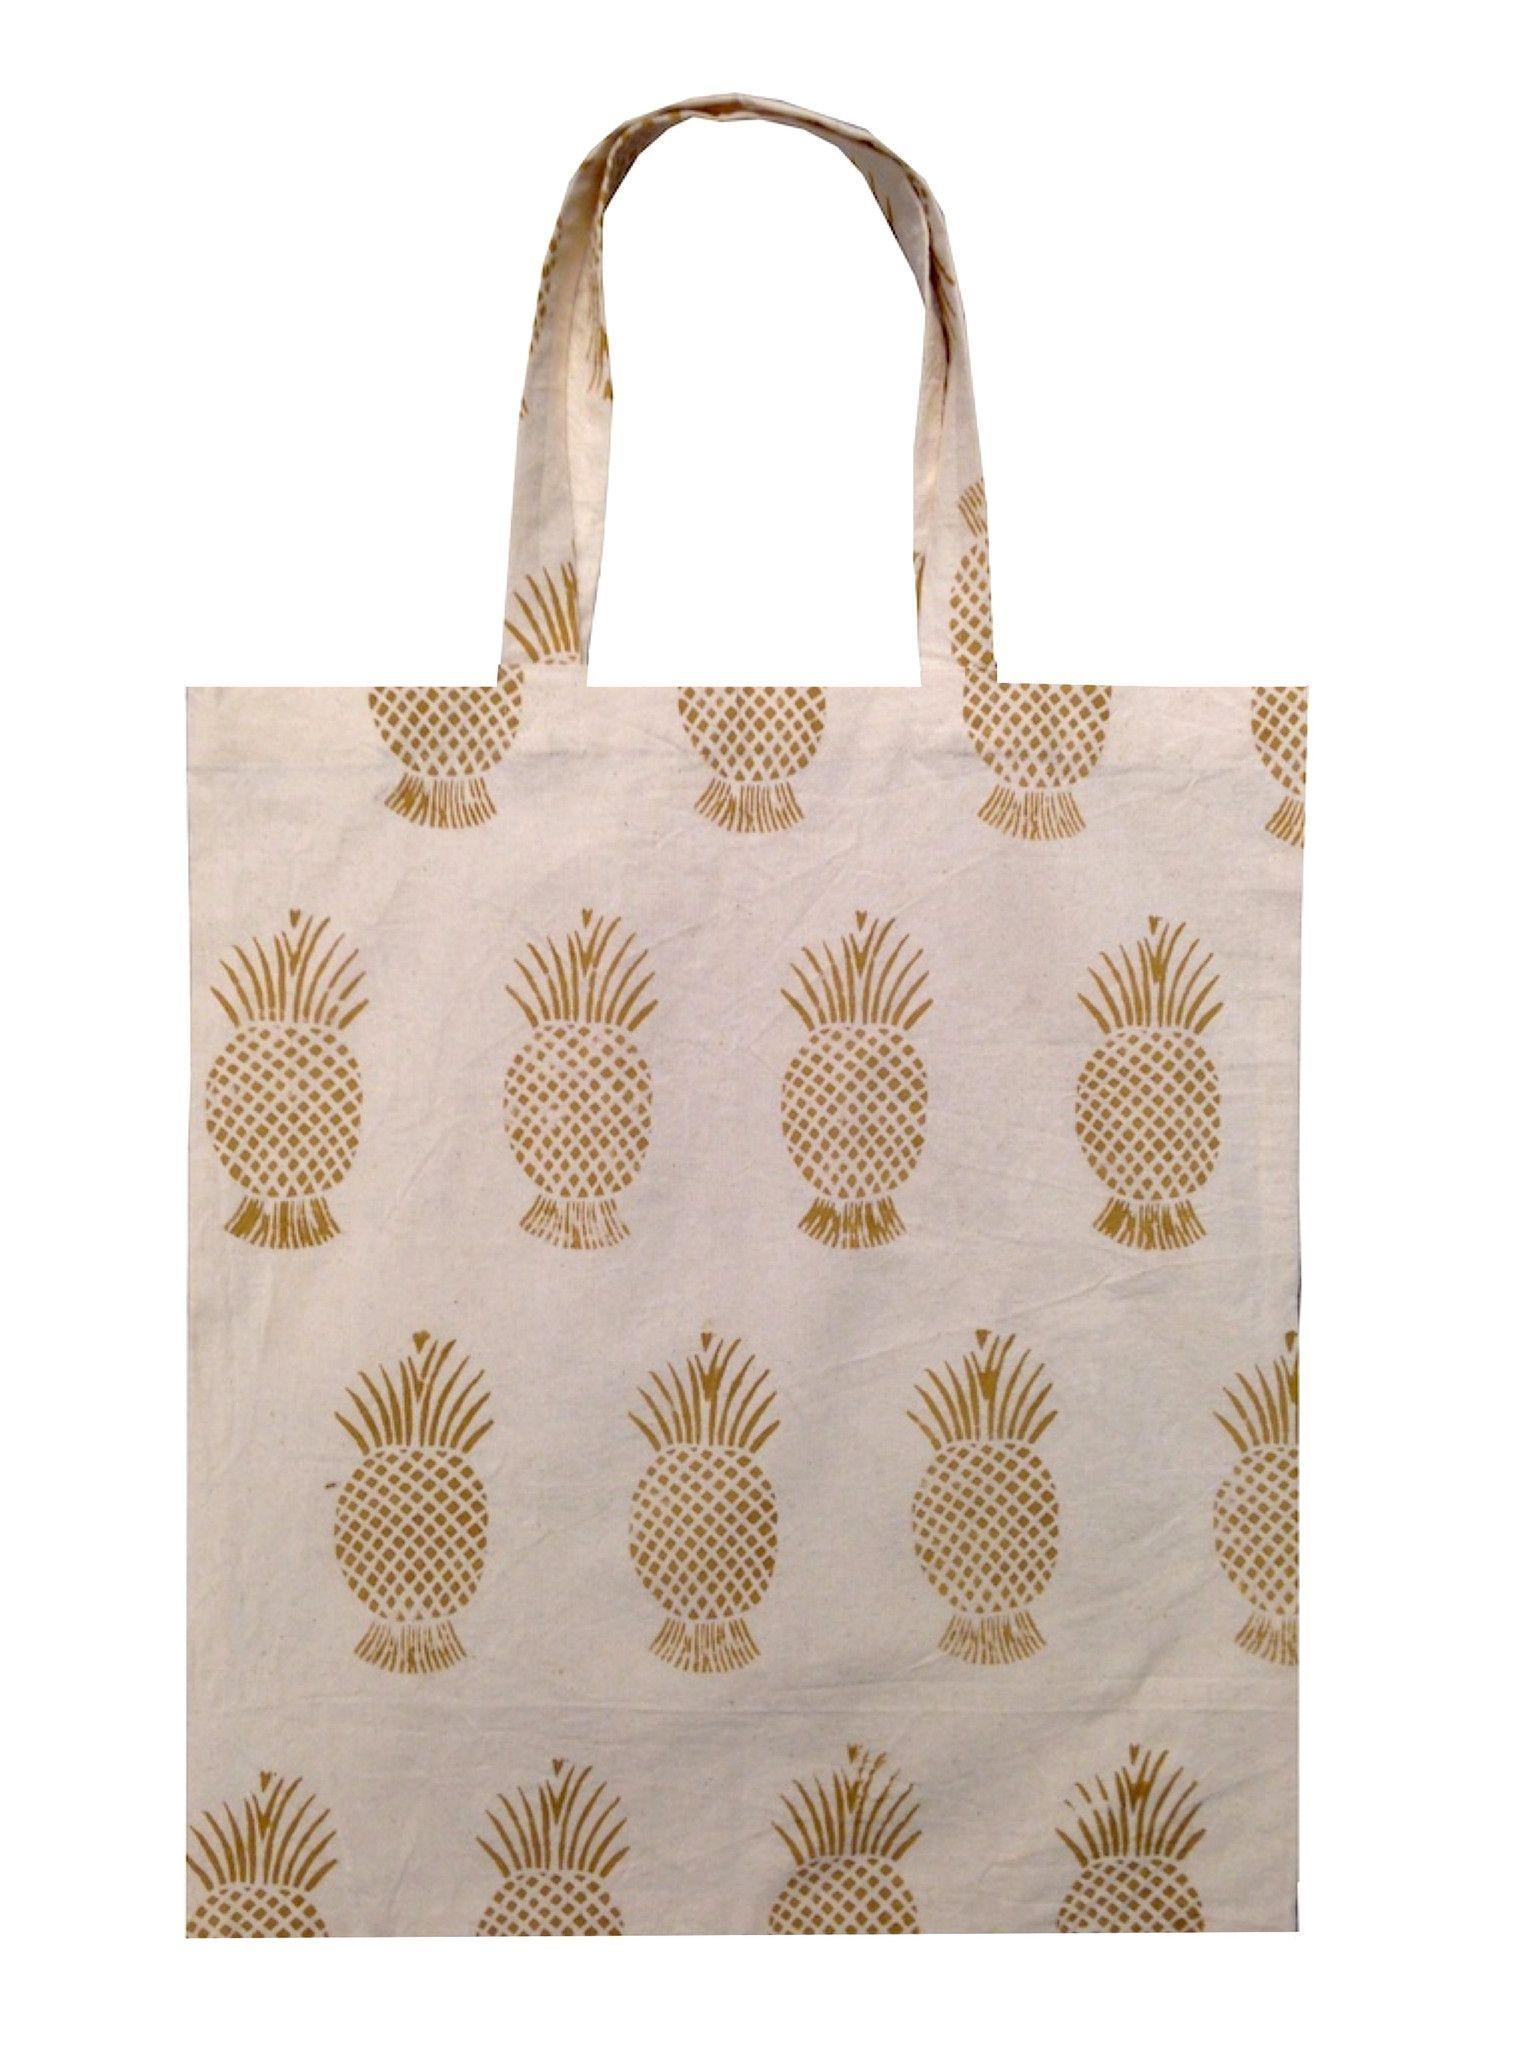 Tote Bag - Boing Tote by VIDA VIDA